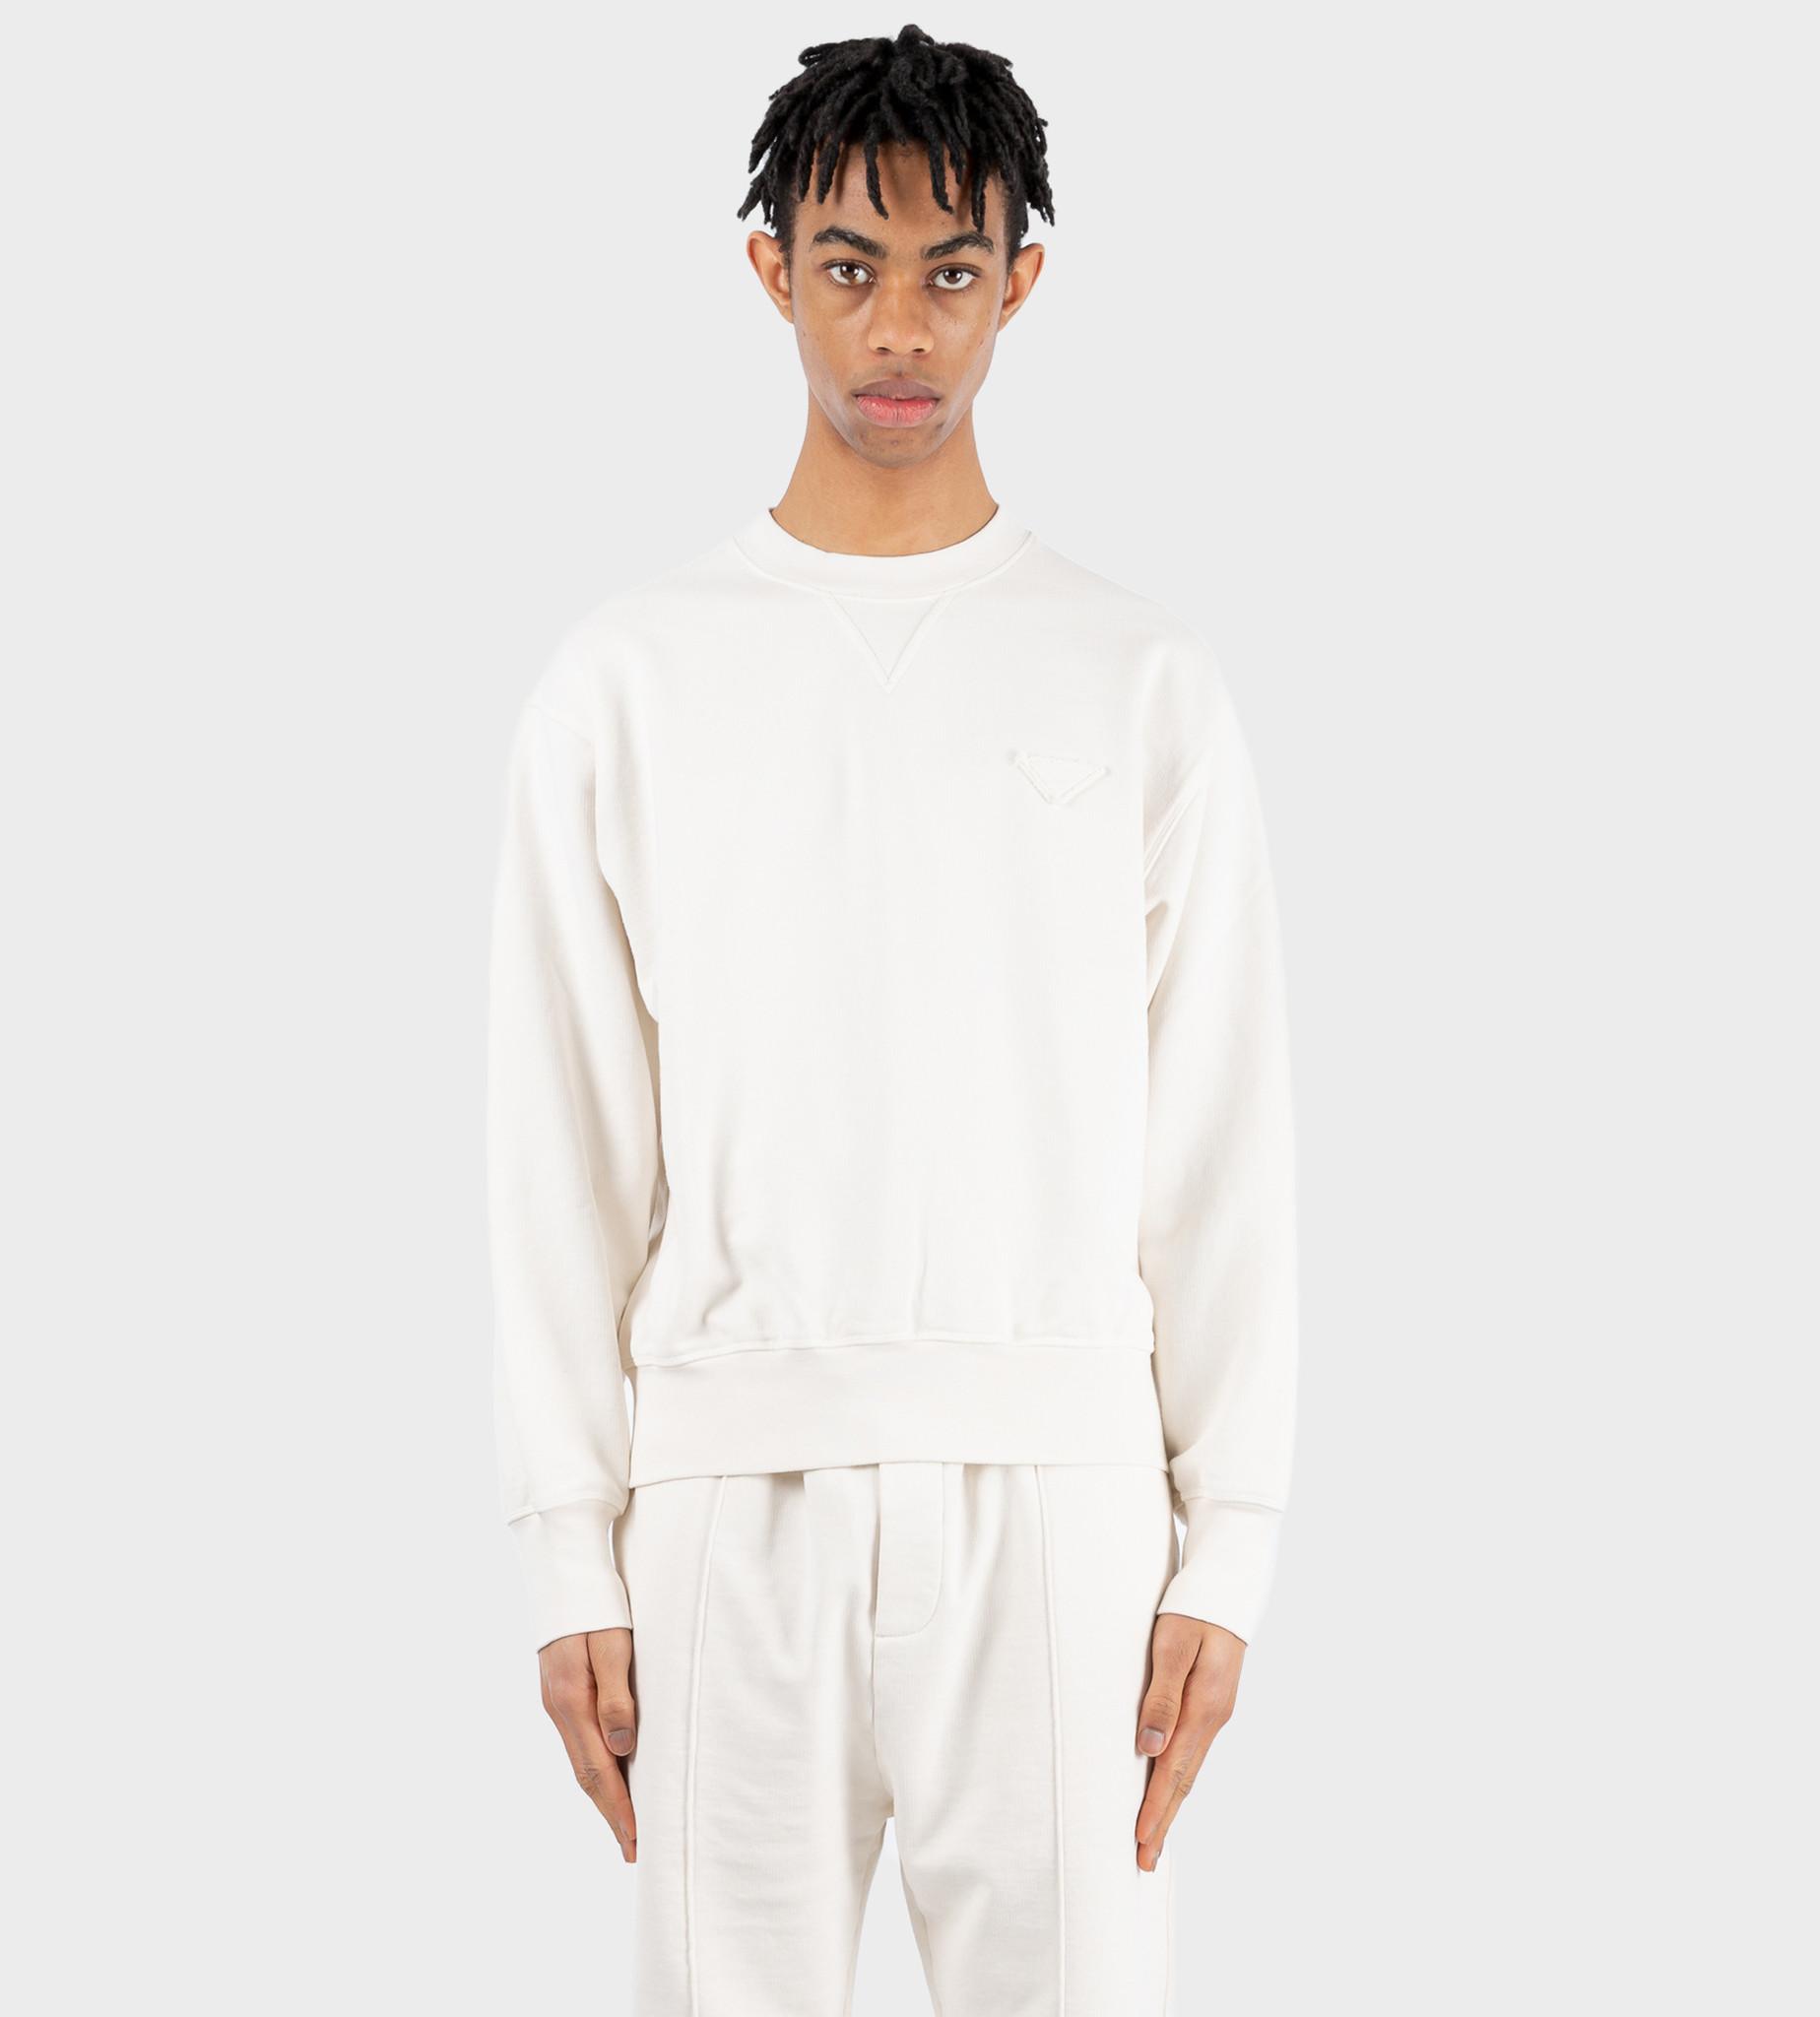 PRADA Garment-Dyed Cotton Sweatshirt Tan